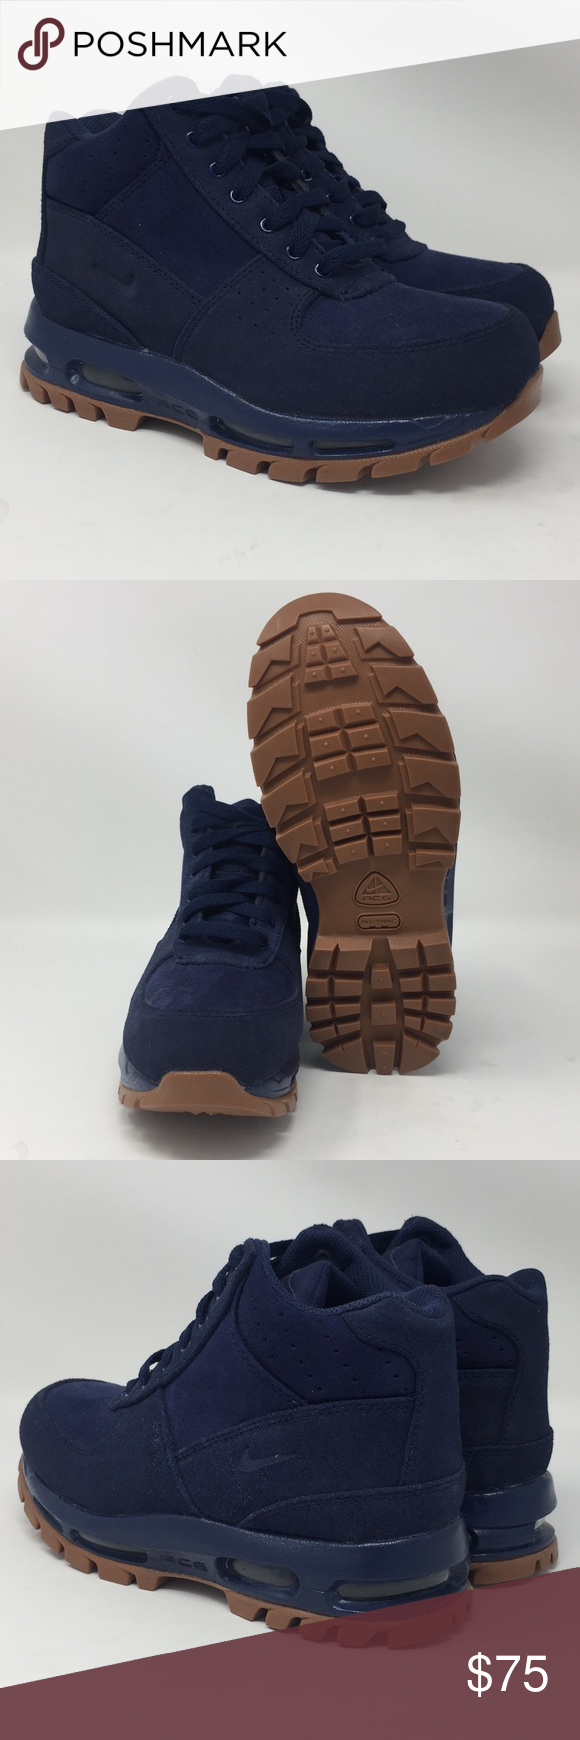 Nike ACG Boots Brand new. Nike ACG boots 4ac0cc02e75d